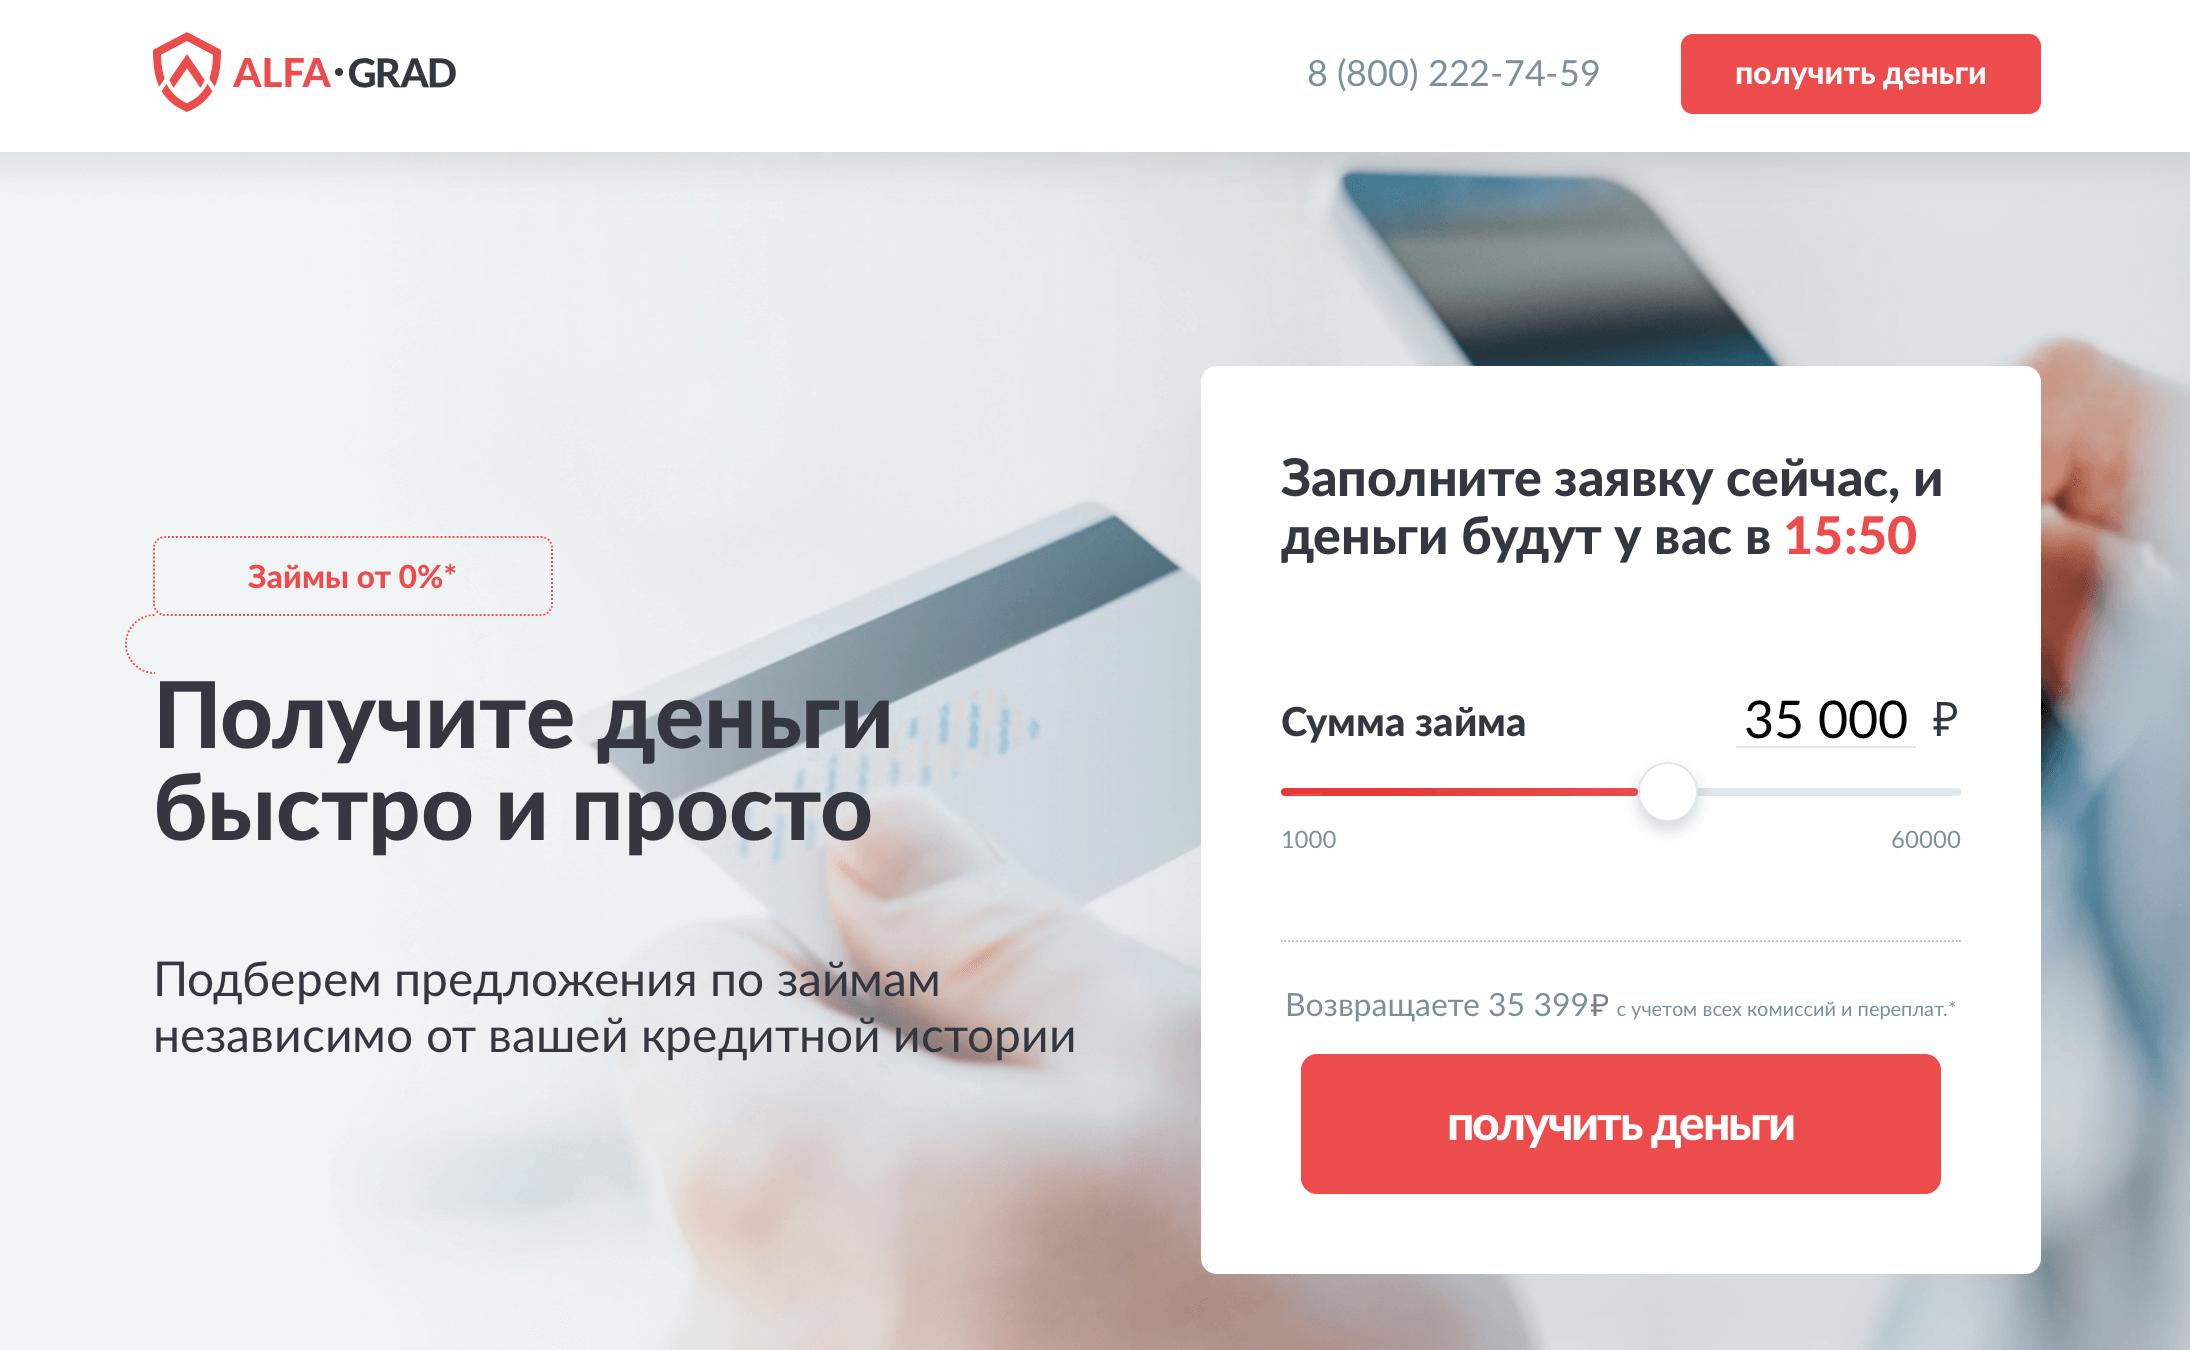 Официальный сайт альфаград